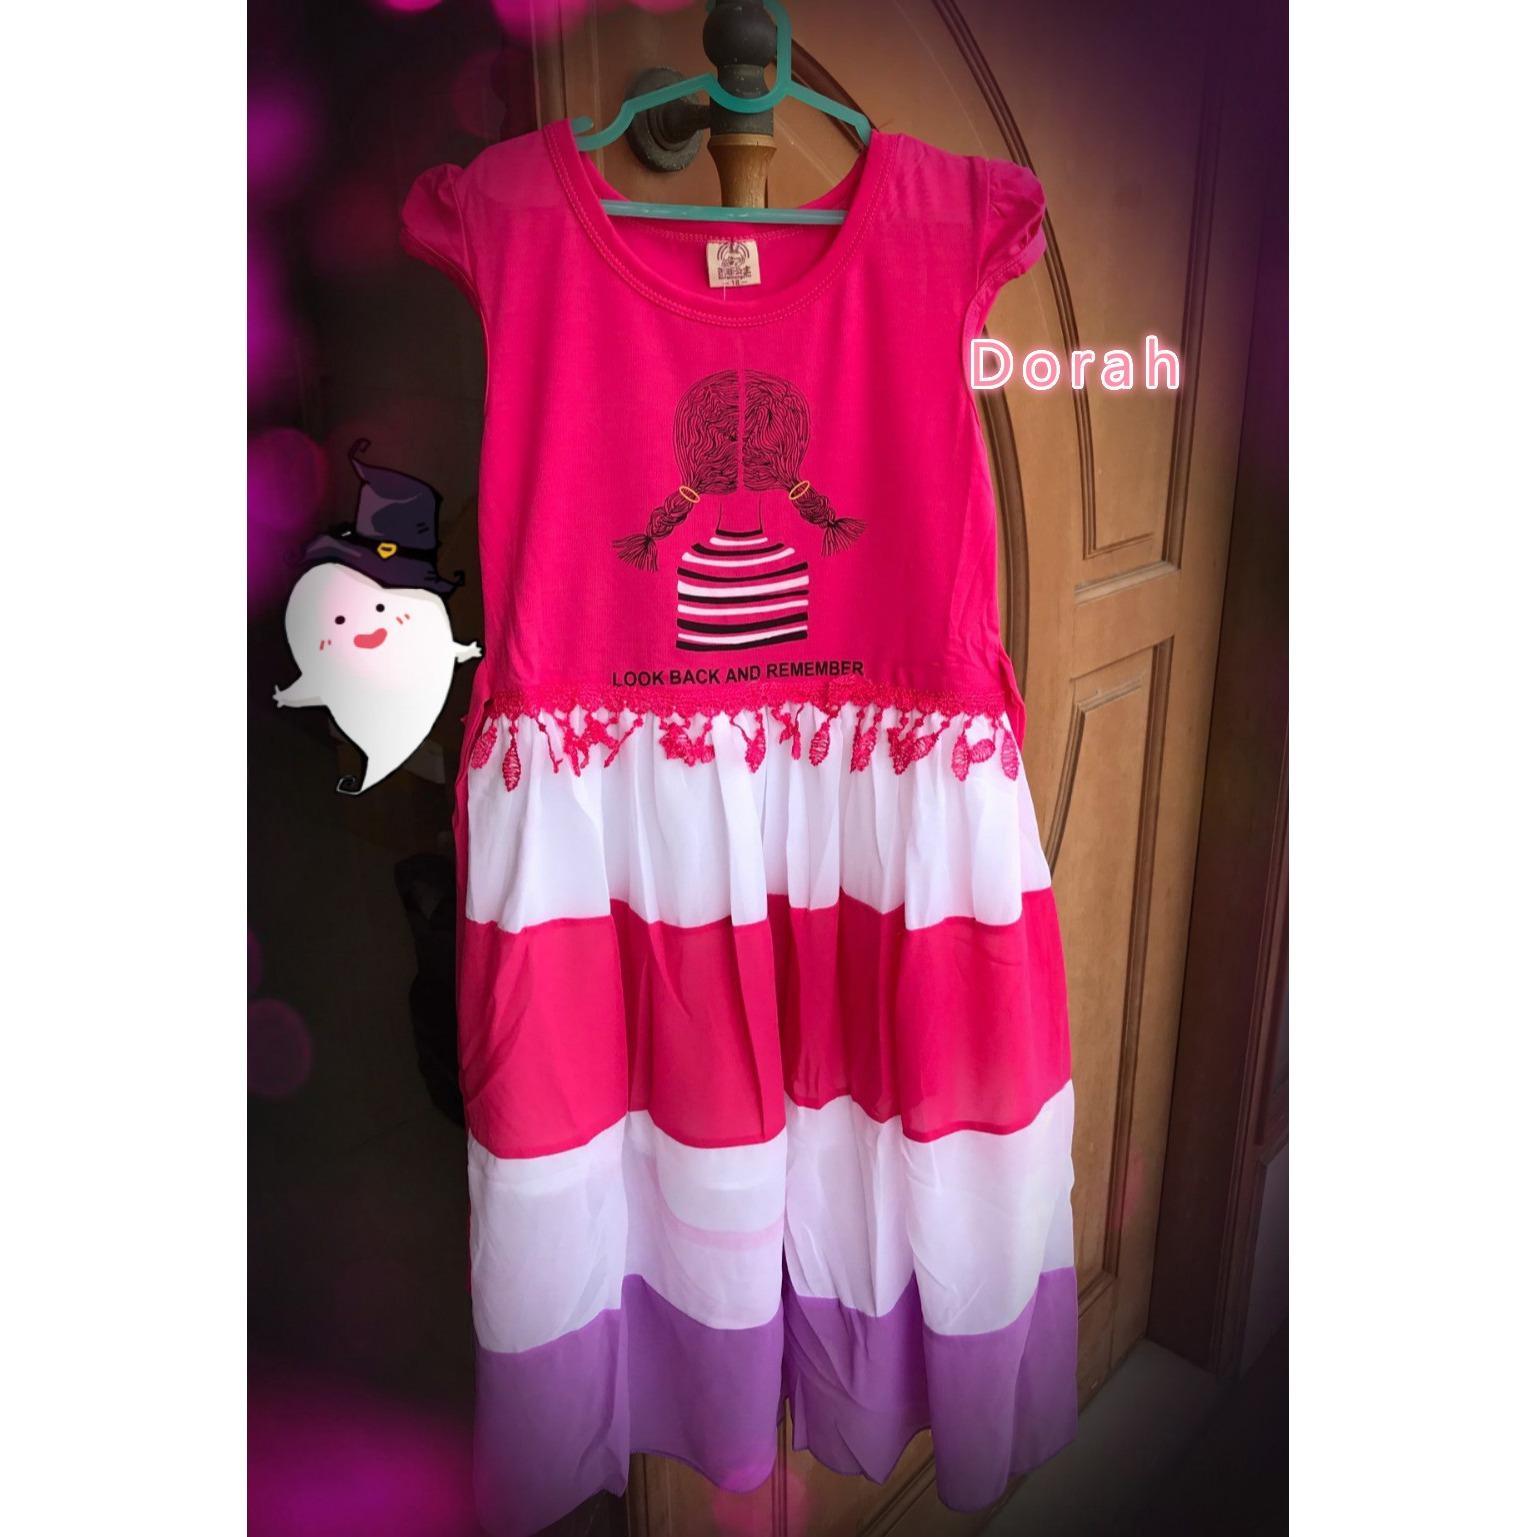 gaun Anak Perempuan /   Dress anak perempuan / gaun pesta anak / Dress hadiah ulang tahun 4.6.8.10th